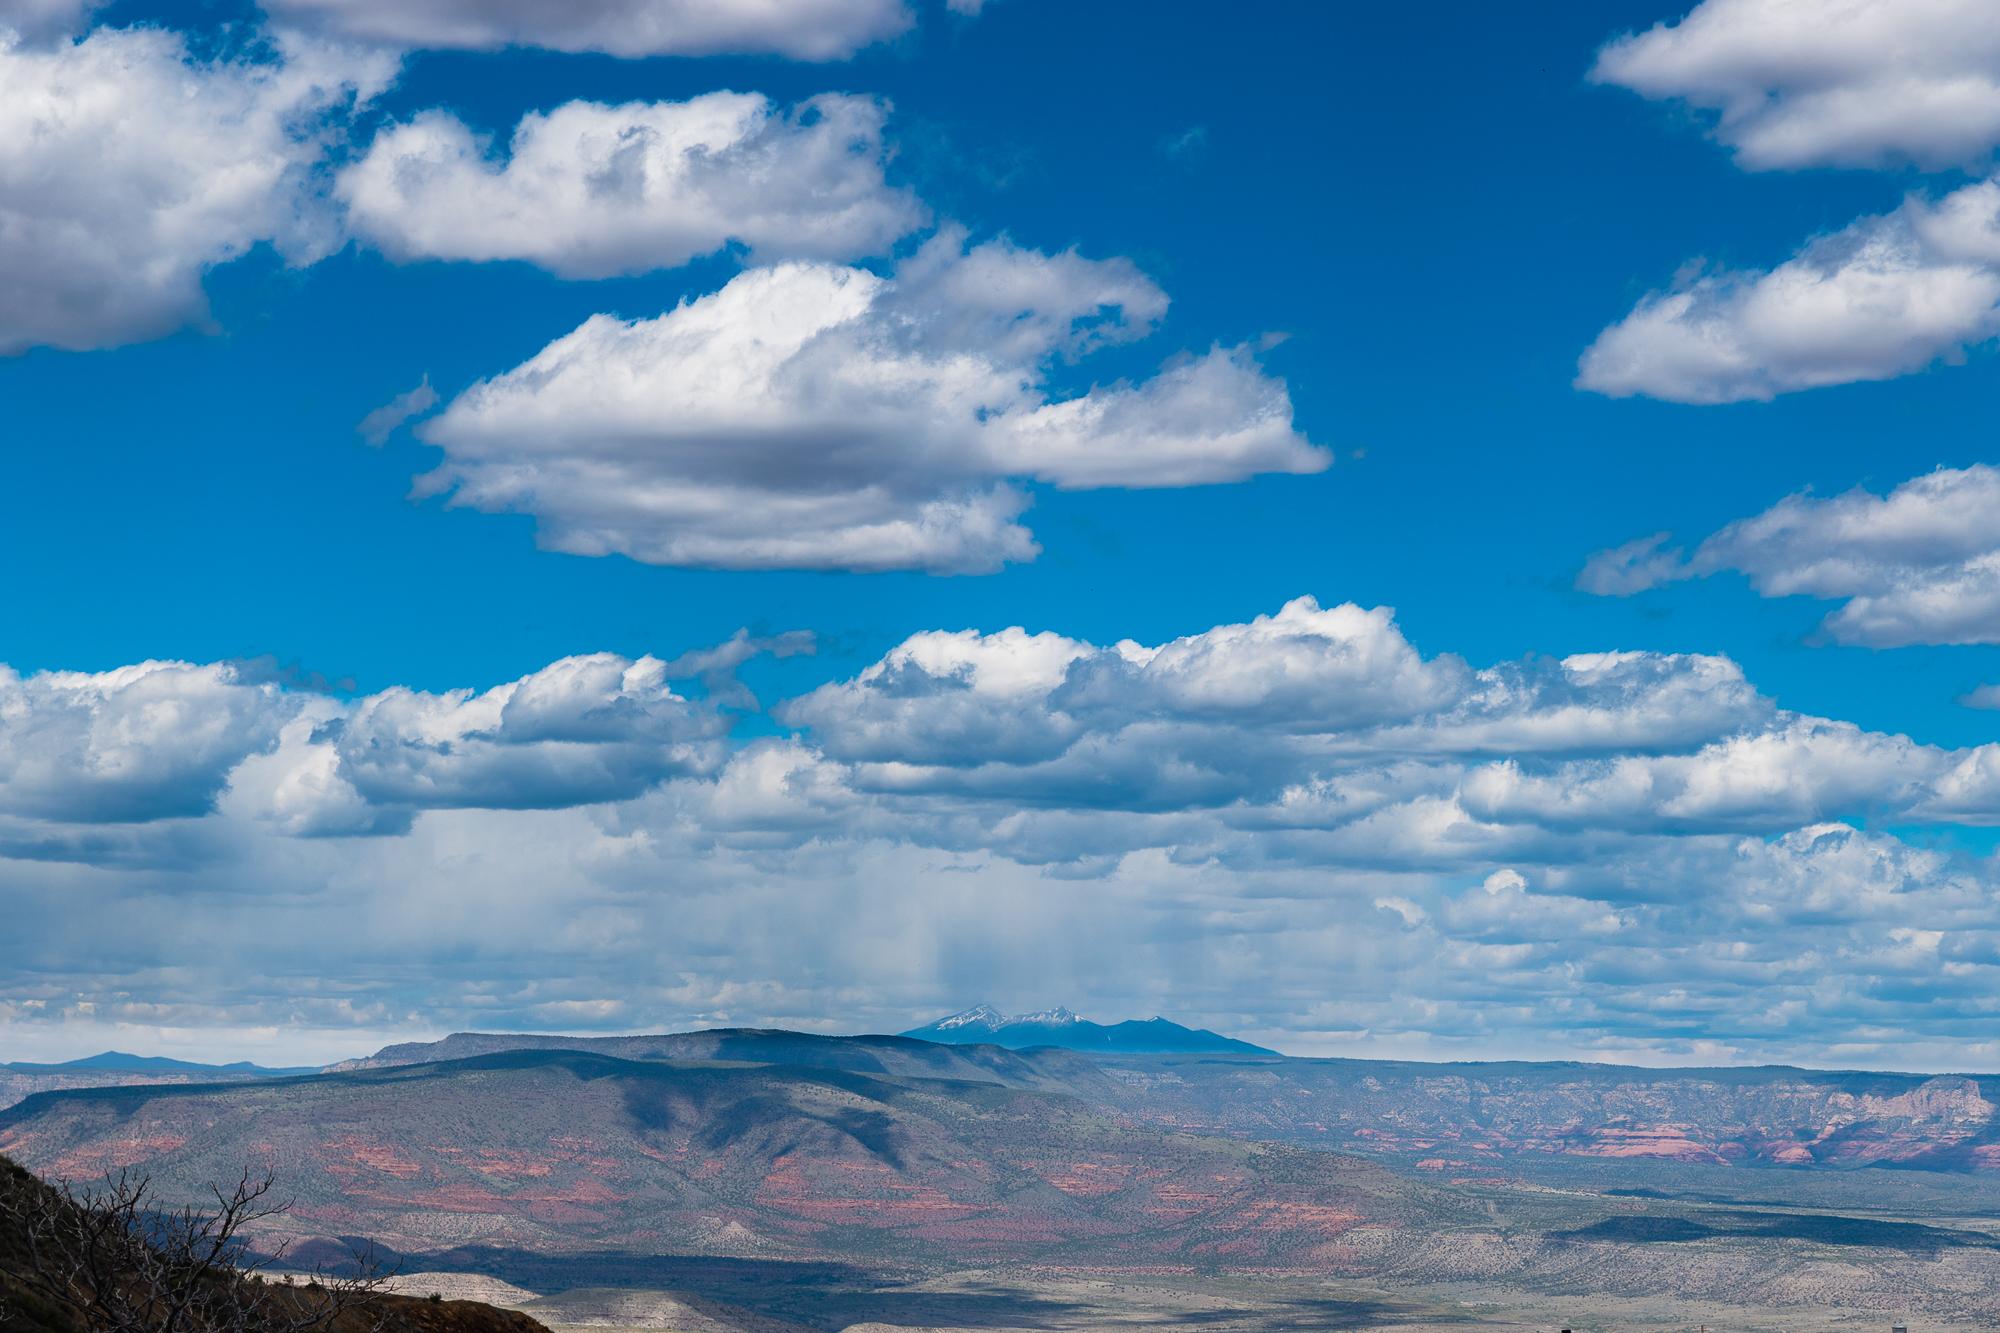 peaks over sycamore-9296.jpg